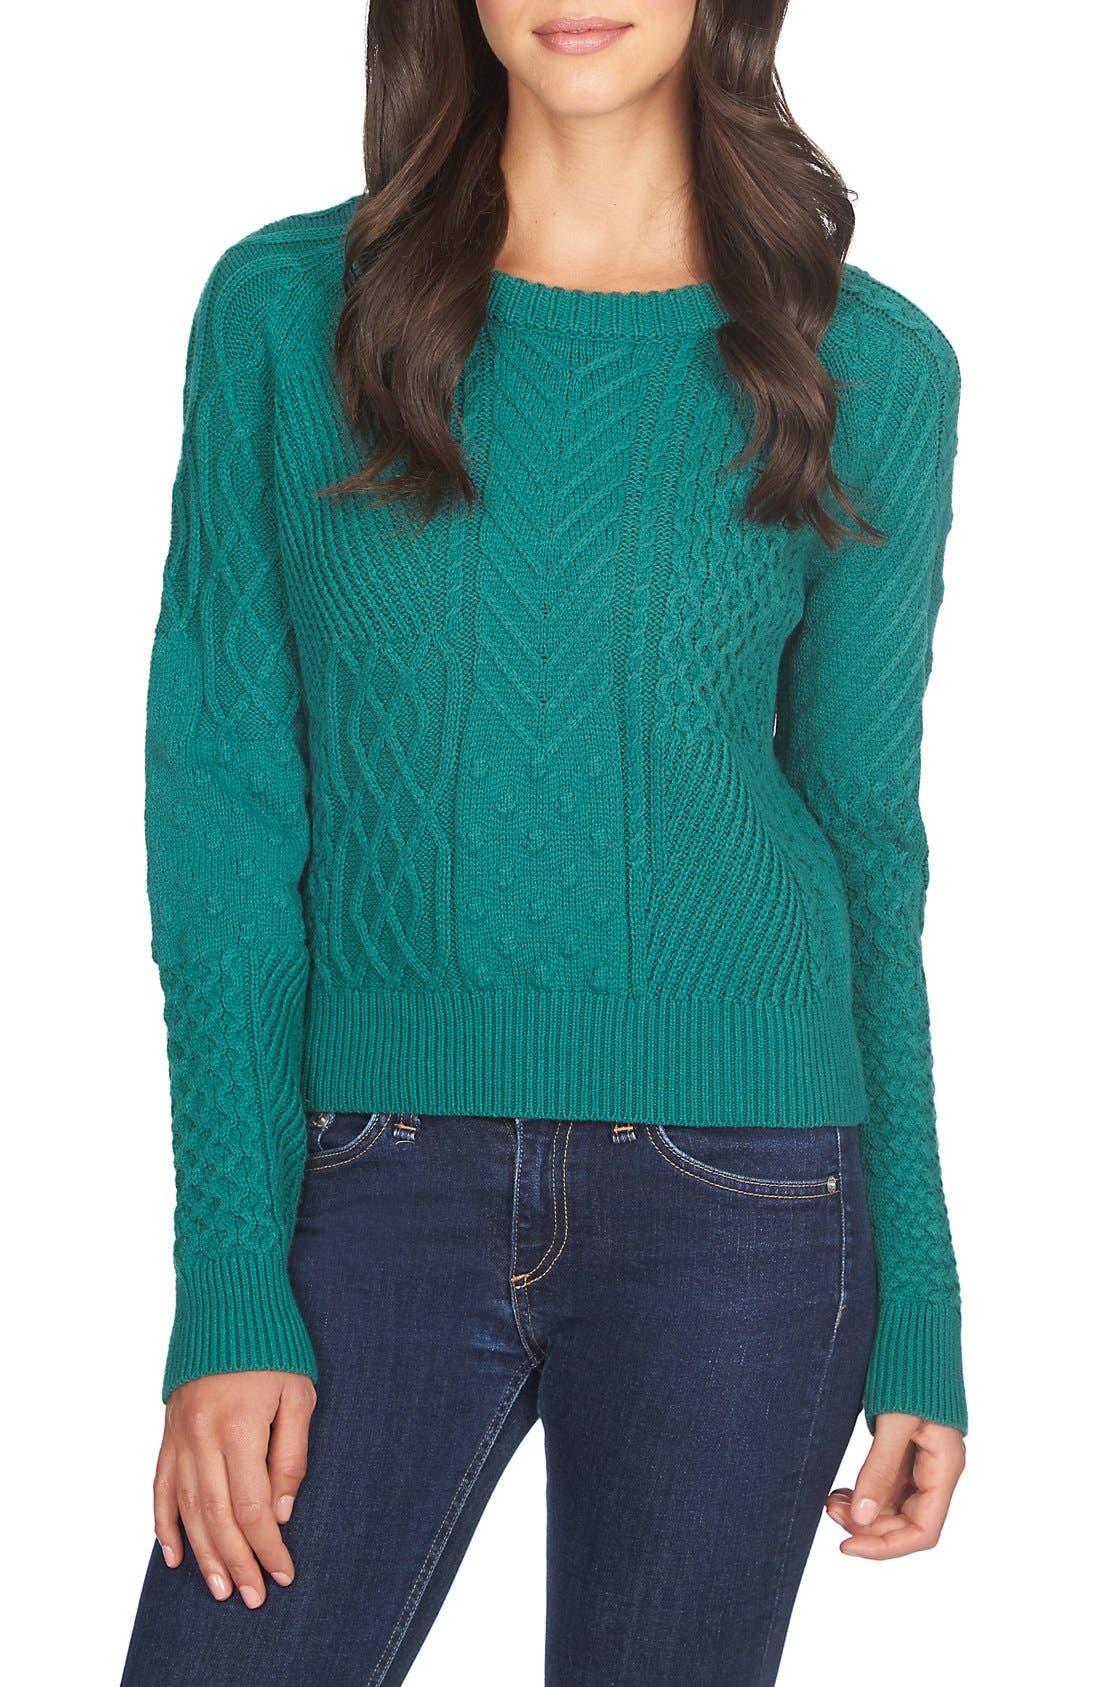 Main Image - 1.STATE CrewneckKnit Sweater